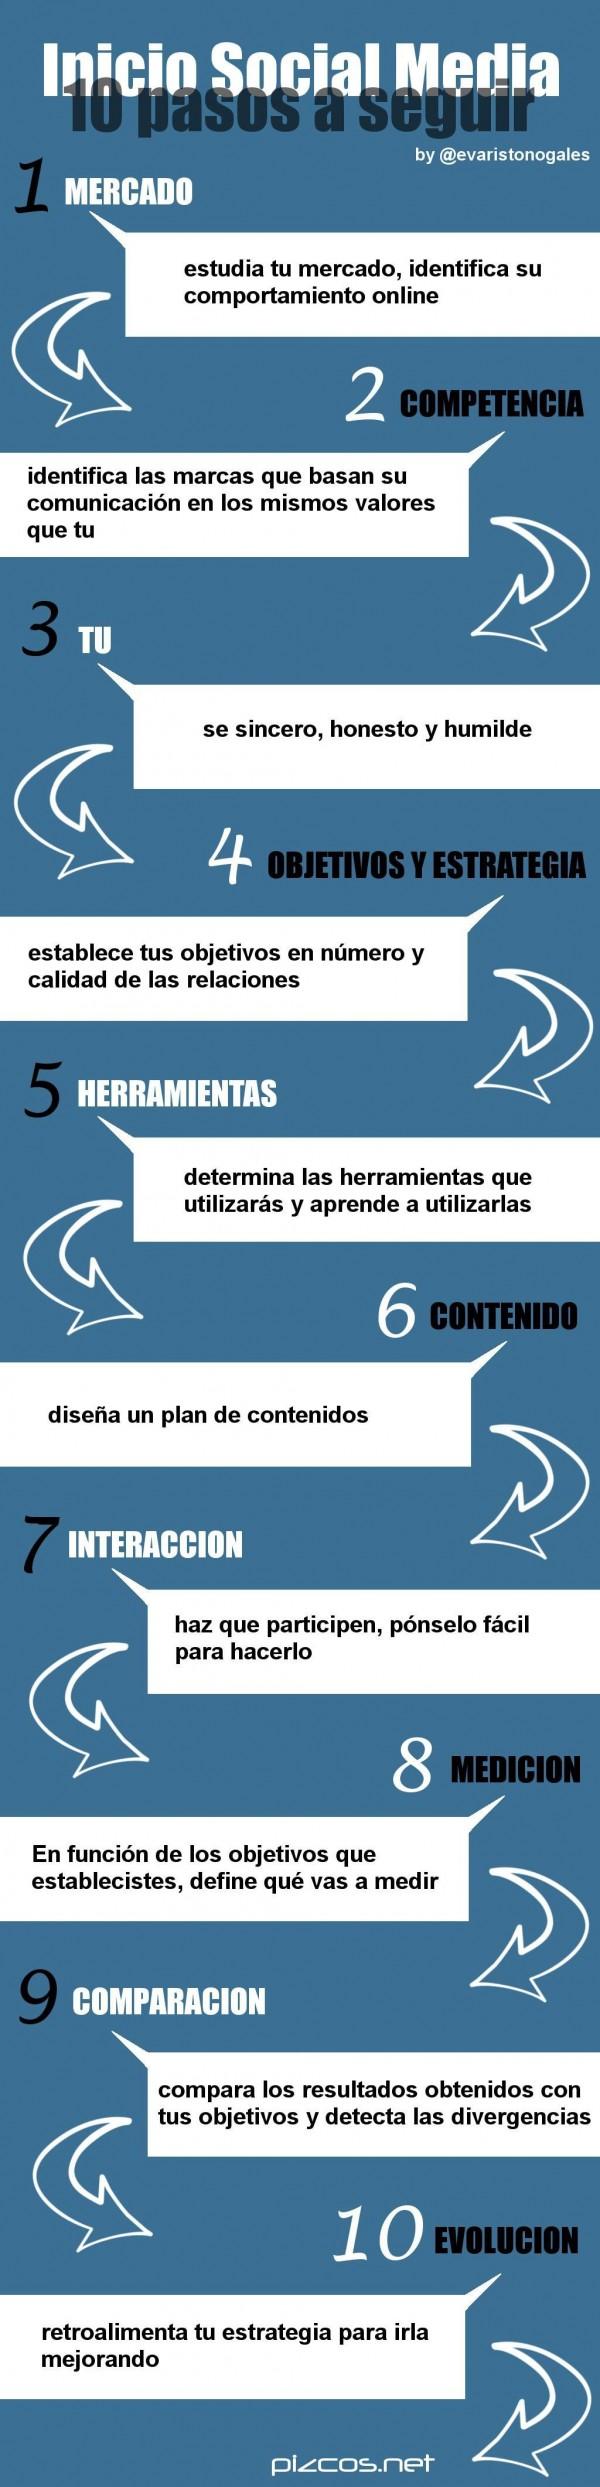 Infografia - 10 pasos a seguir para un inicio rápido en el Social Media #infografia #infographic